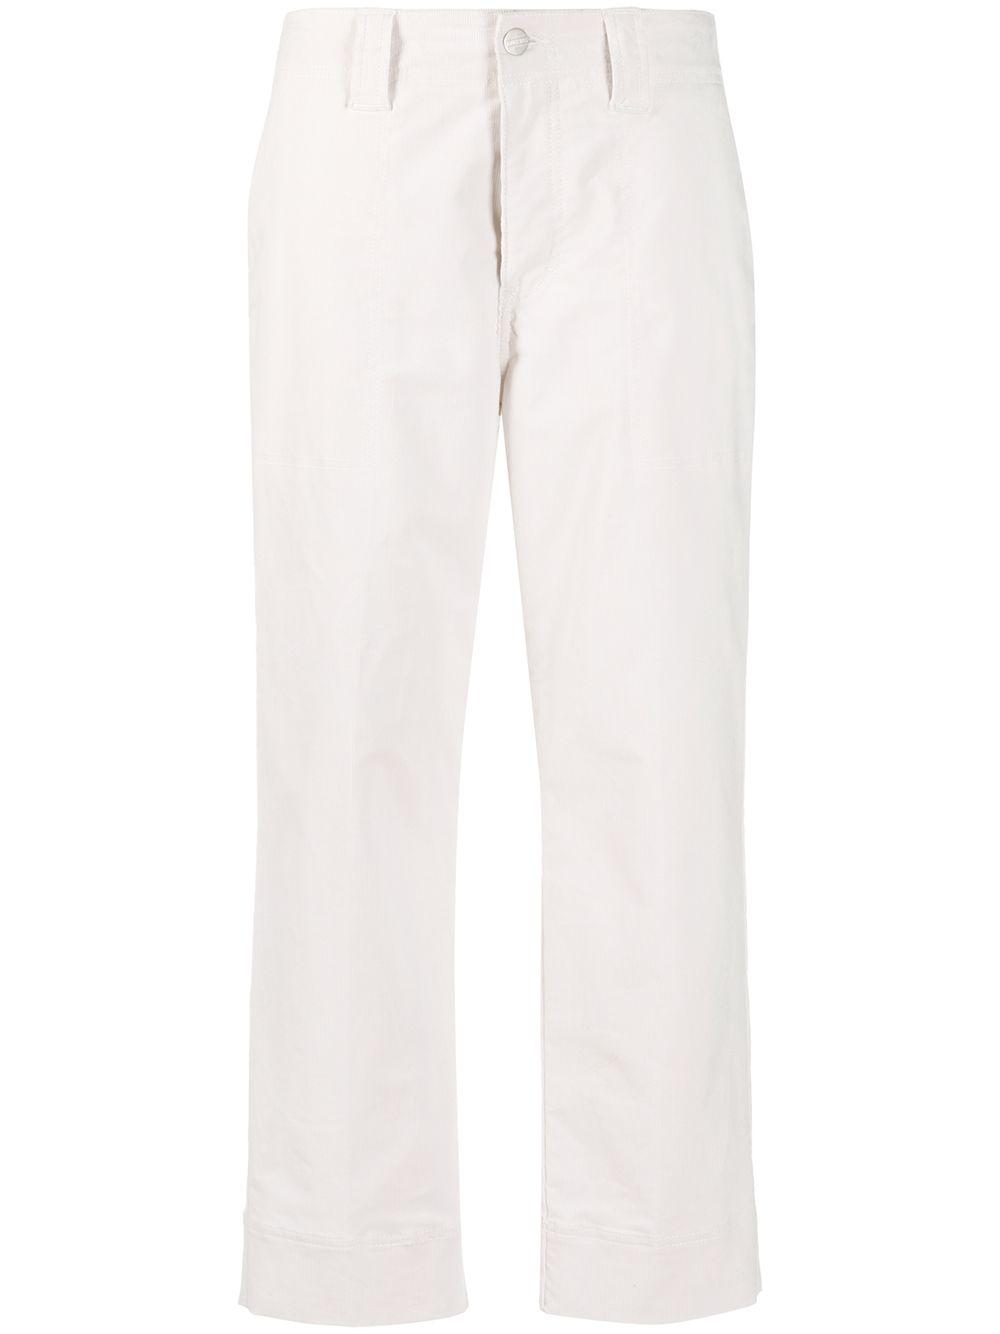 Josy Jeans